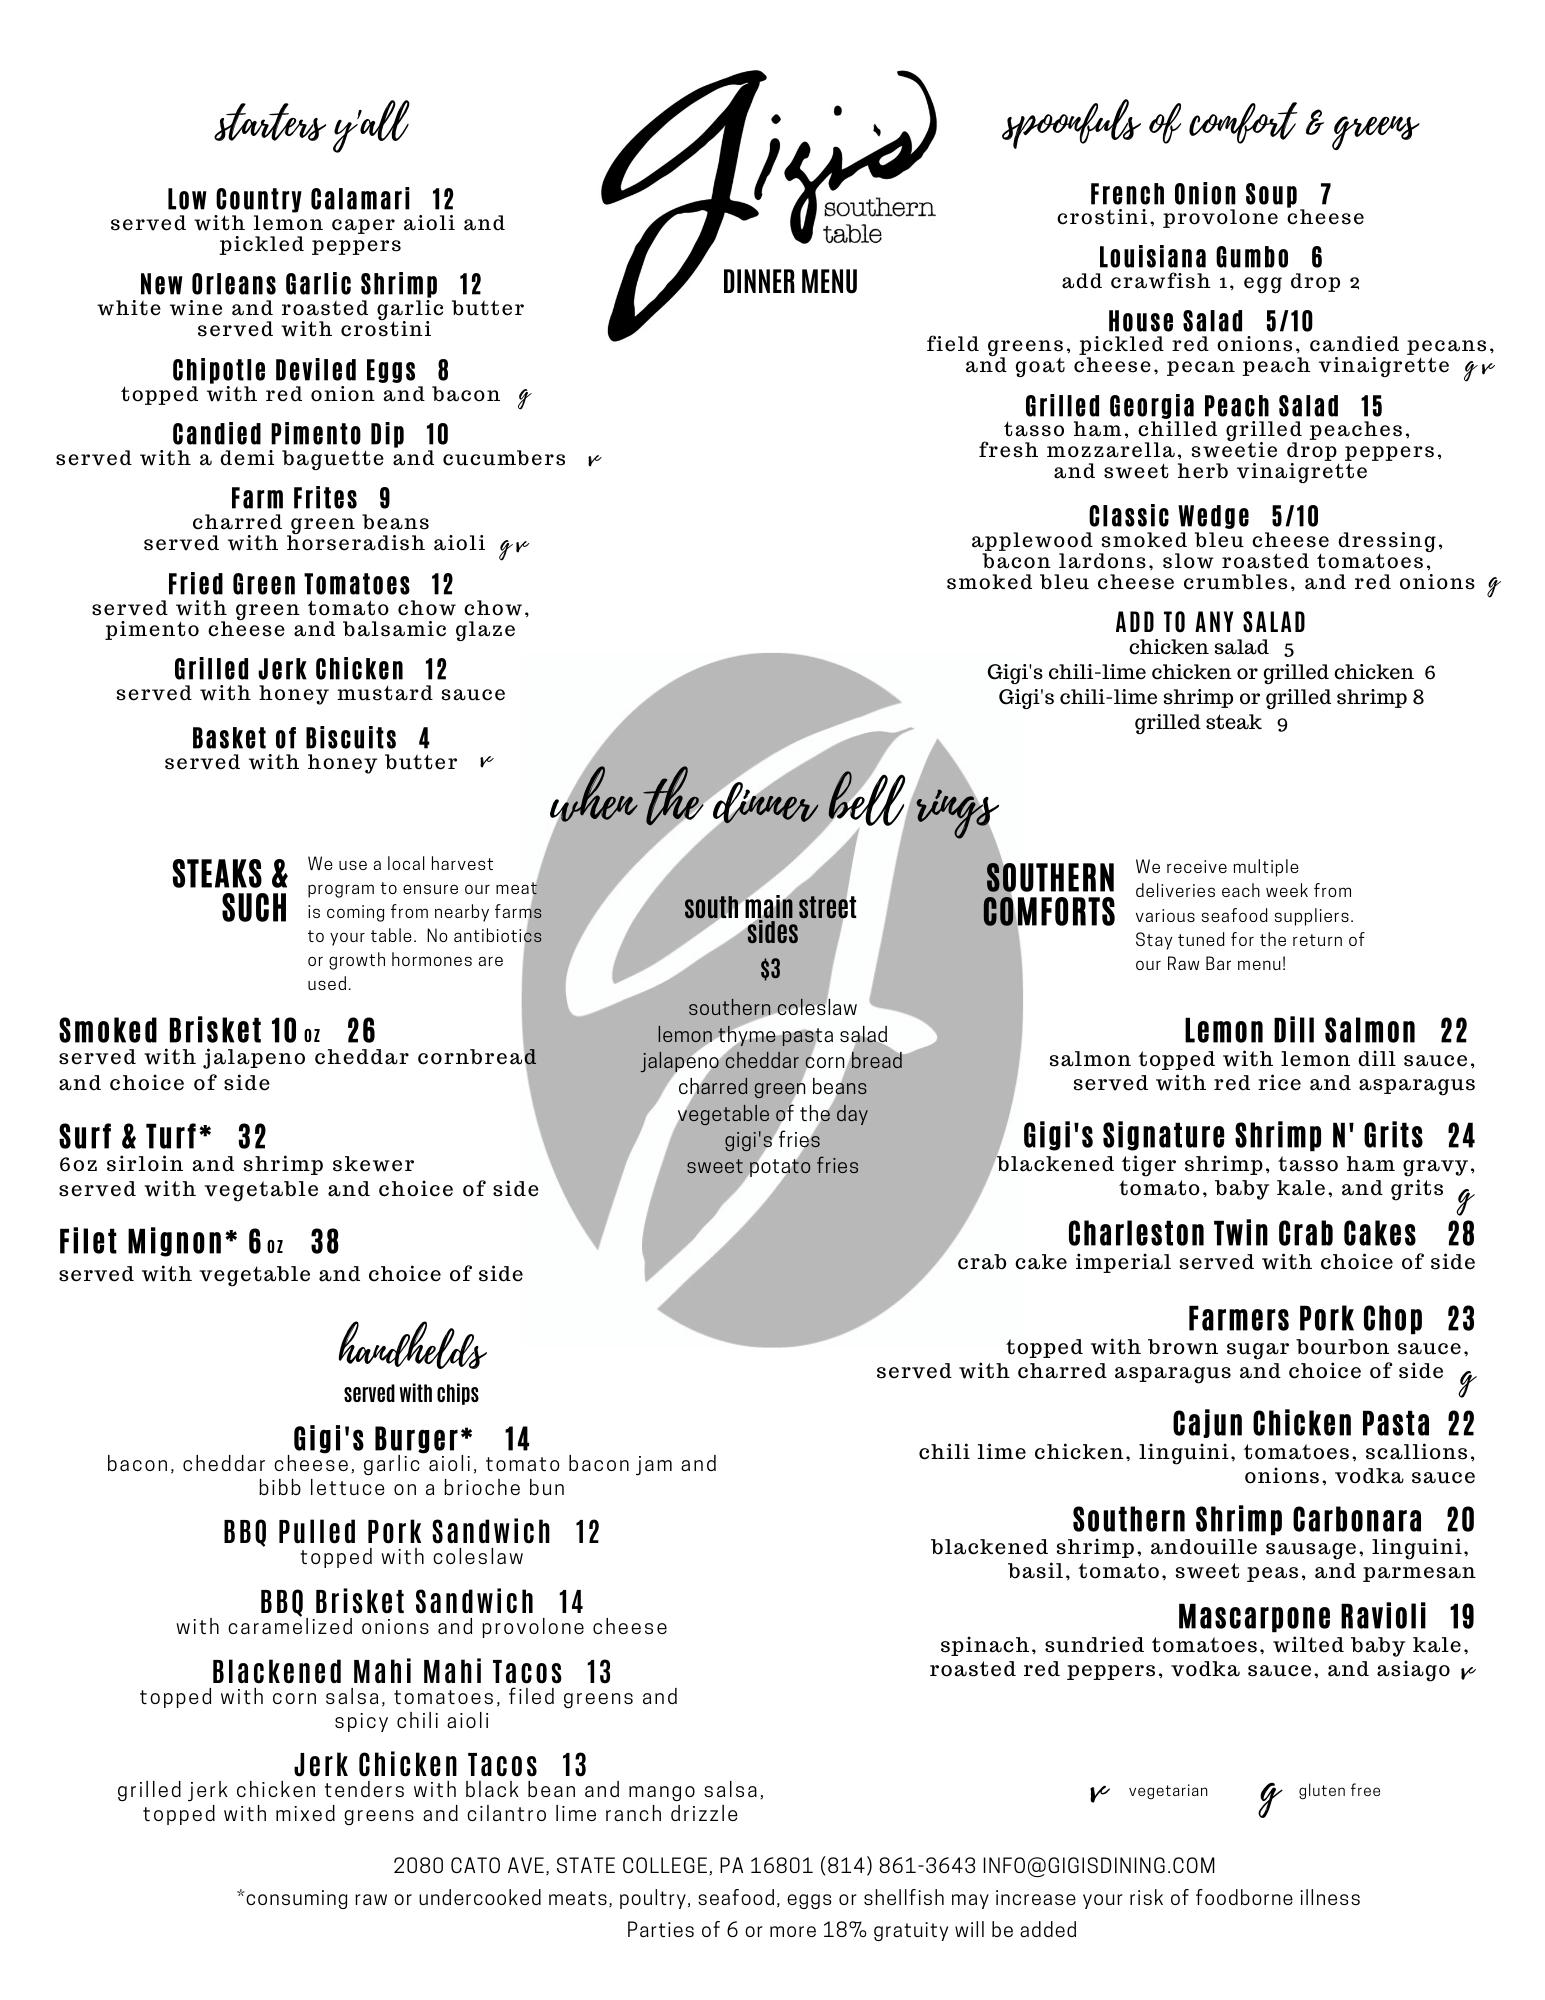 gigis dinner menu june 2020